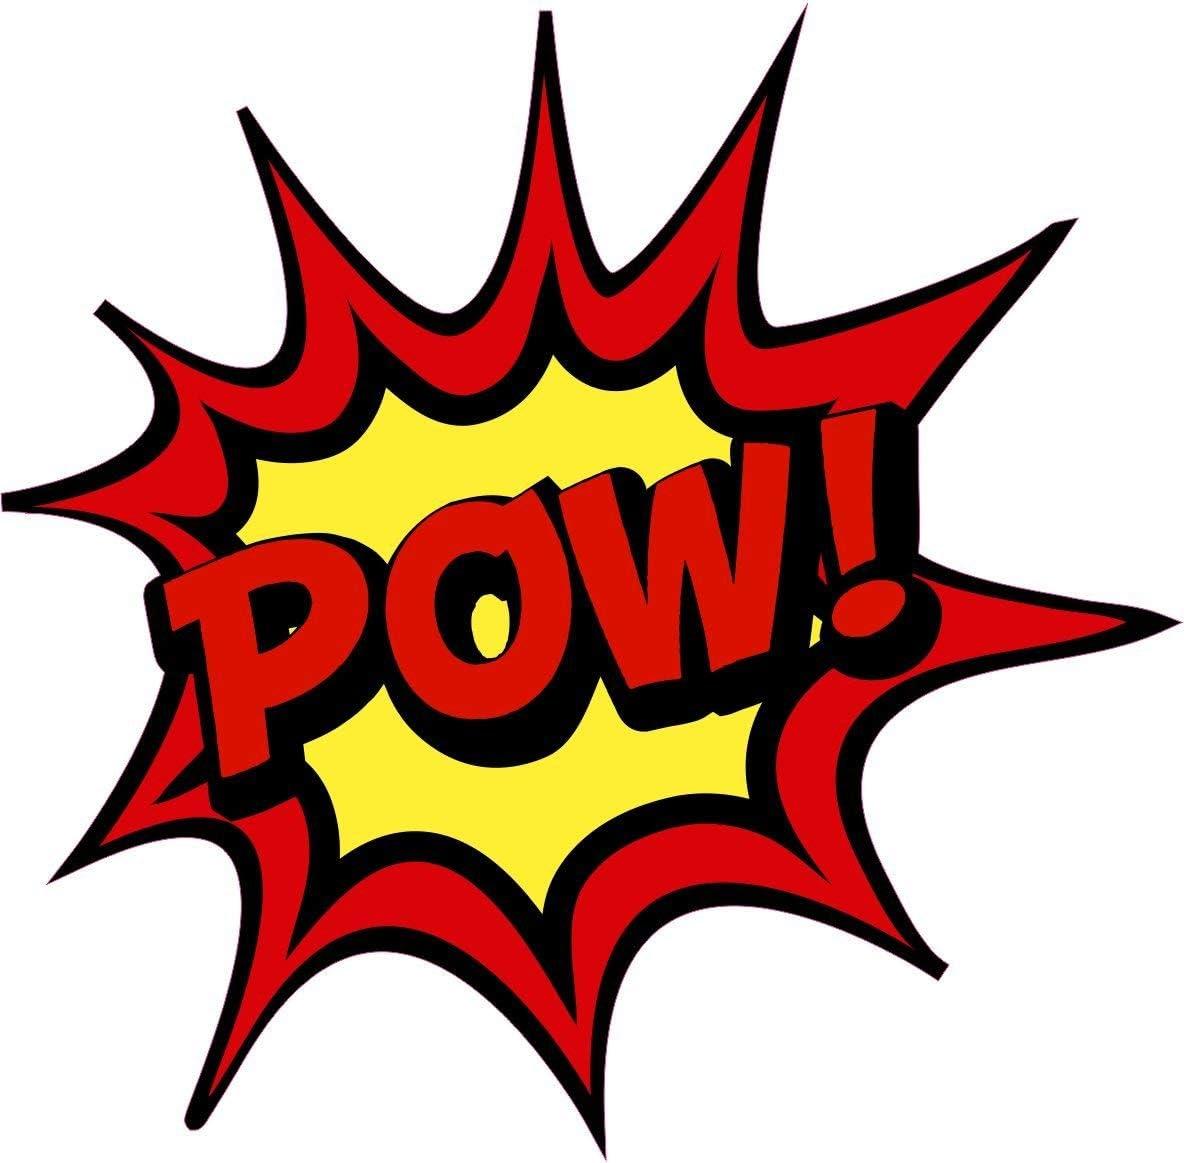 Netspares 121022321 1 X Aufkleber Pow Bang Boom Pang Spruch Comic Sticker Tuning Decal Fun Gag Ok Auto